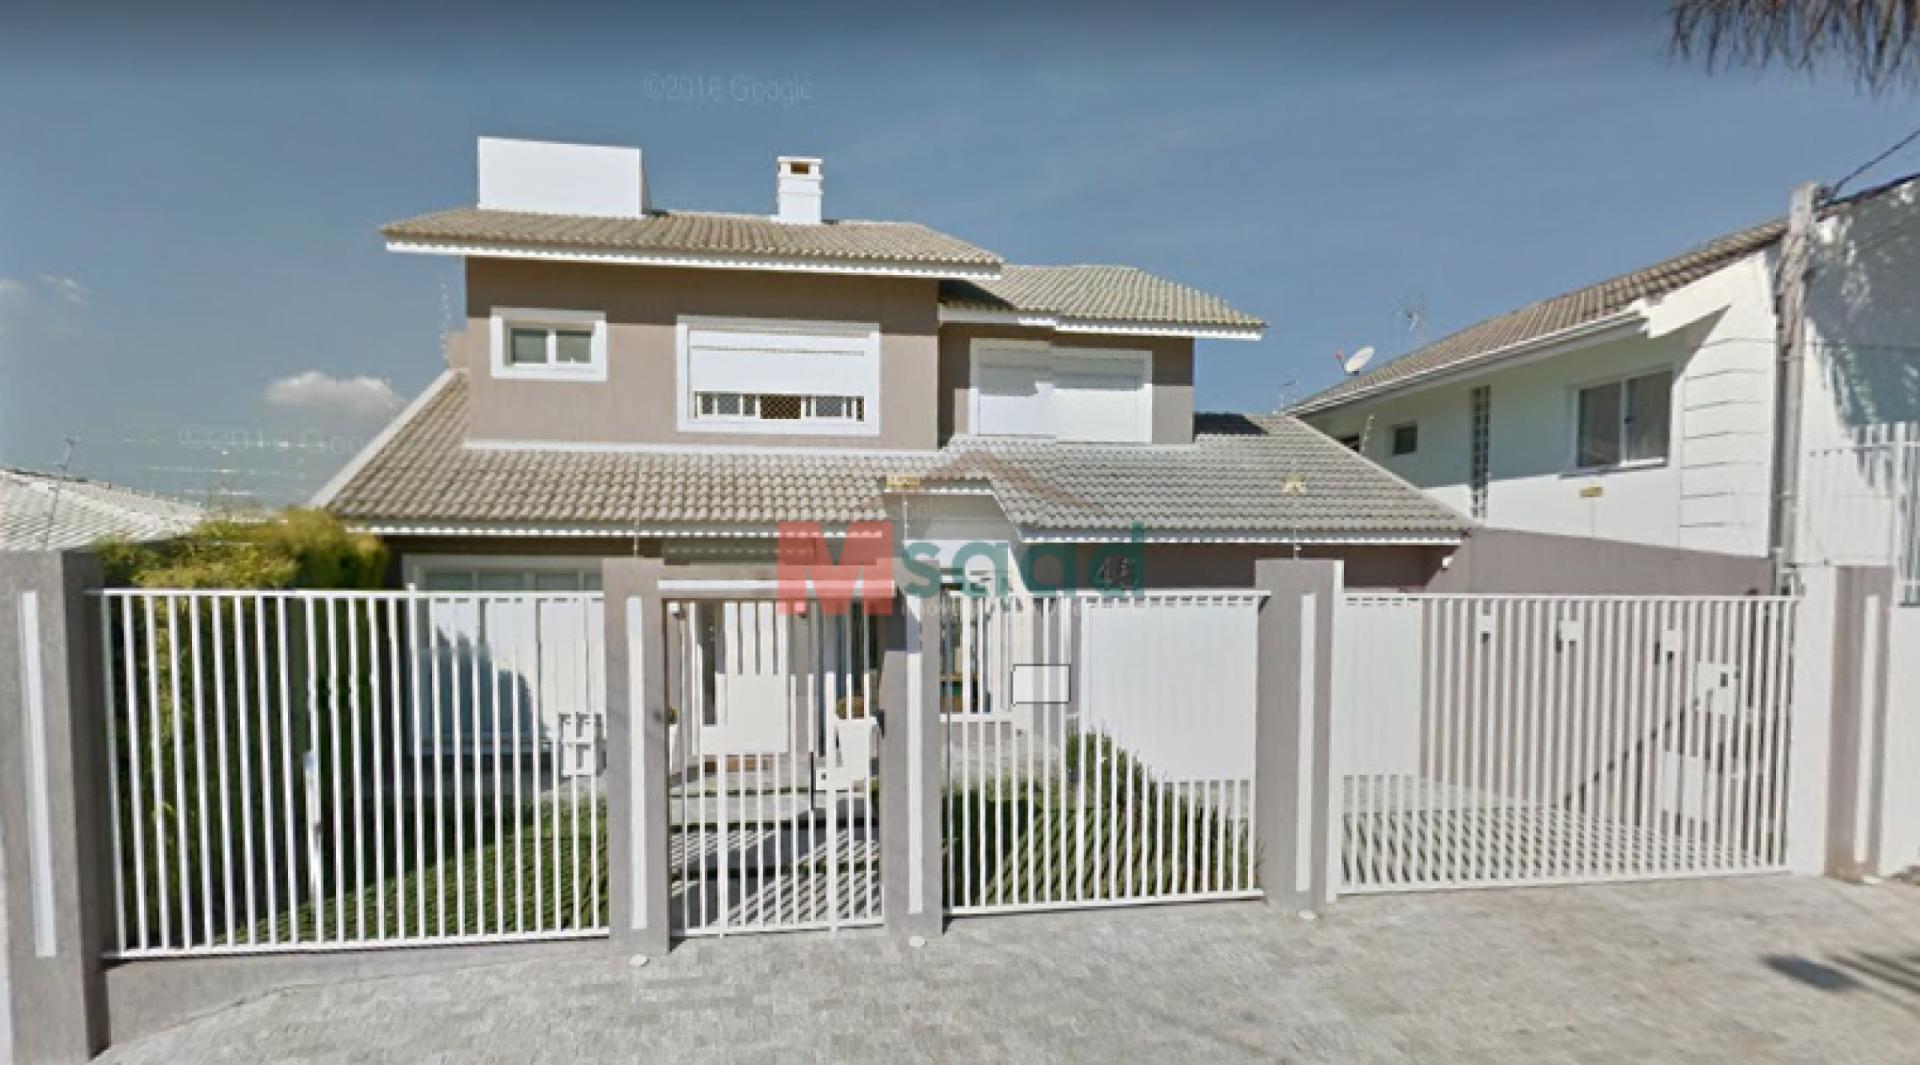 <strong>Casa em Condomínio</strong><small>(3 dormitórios sendo 1 suíte)</small>